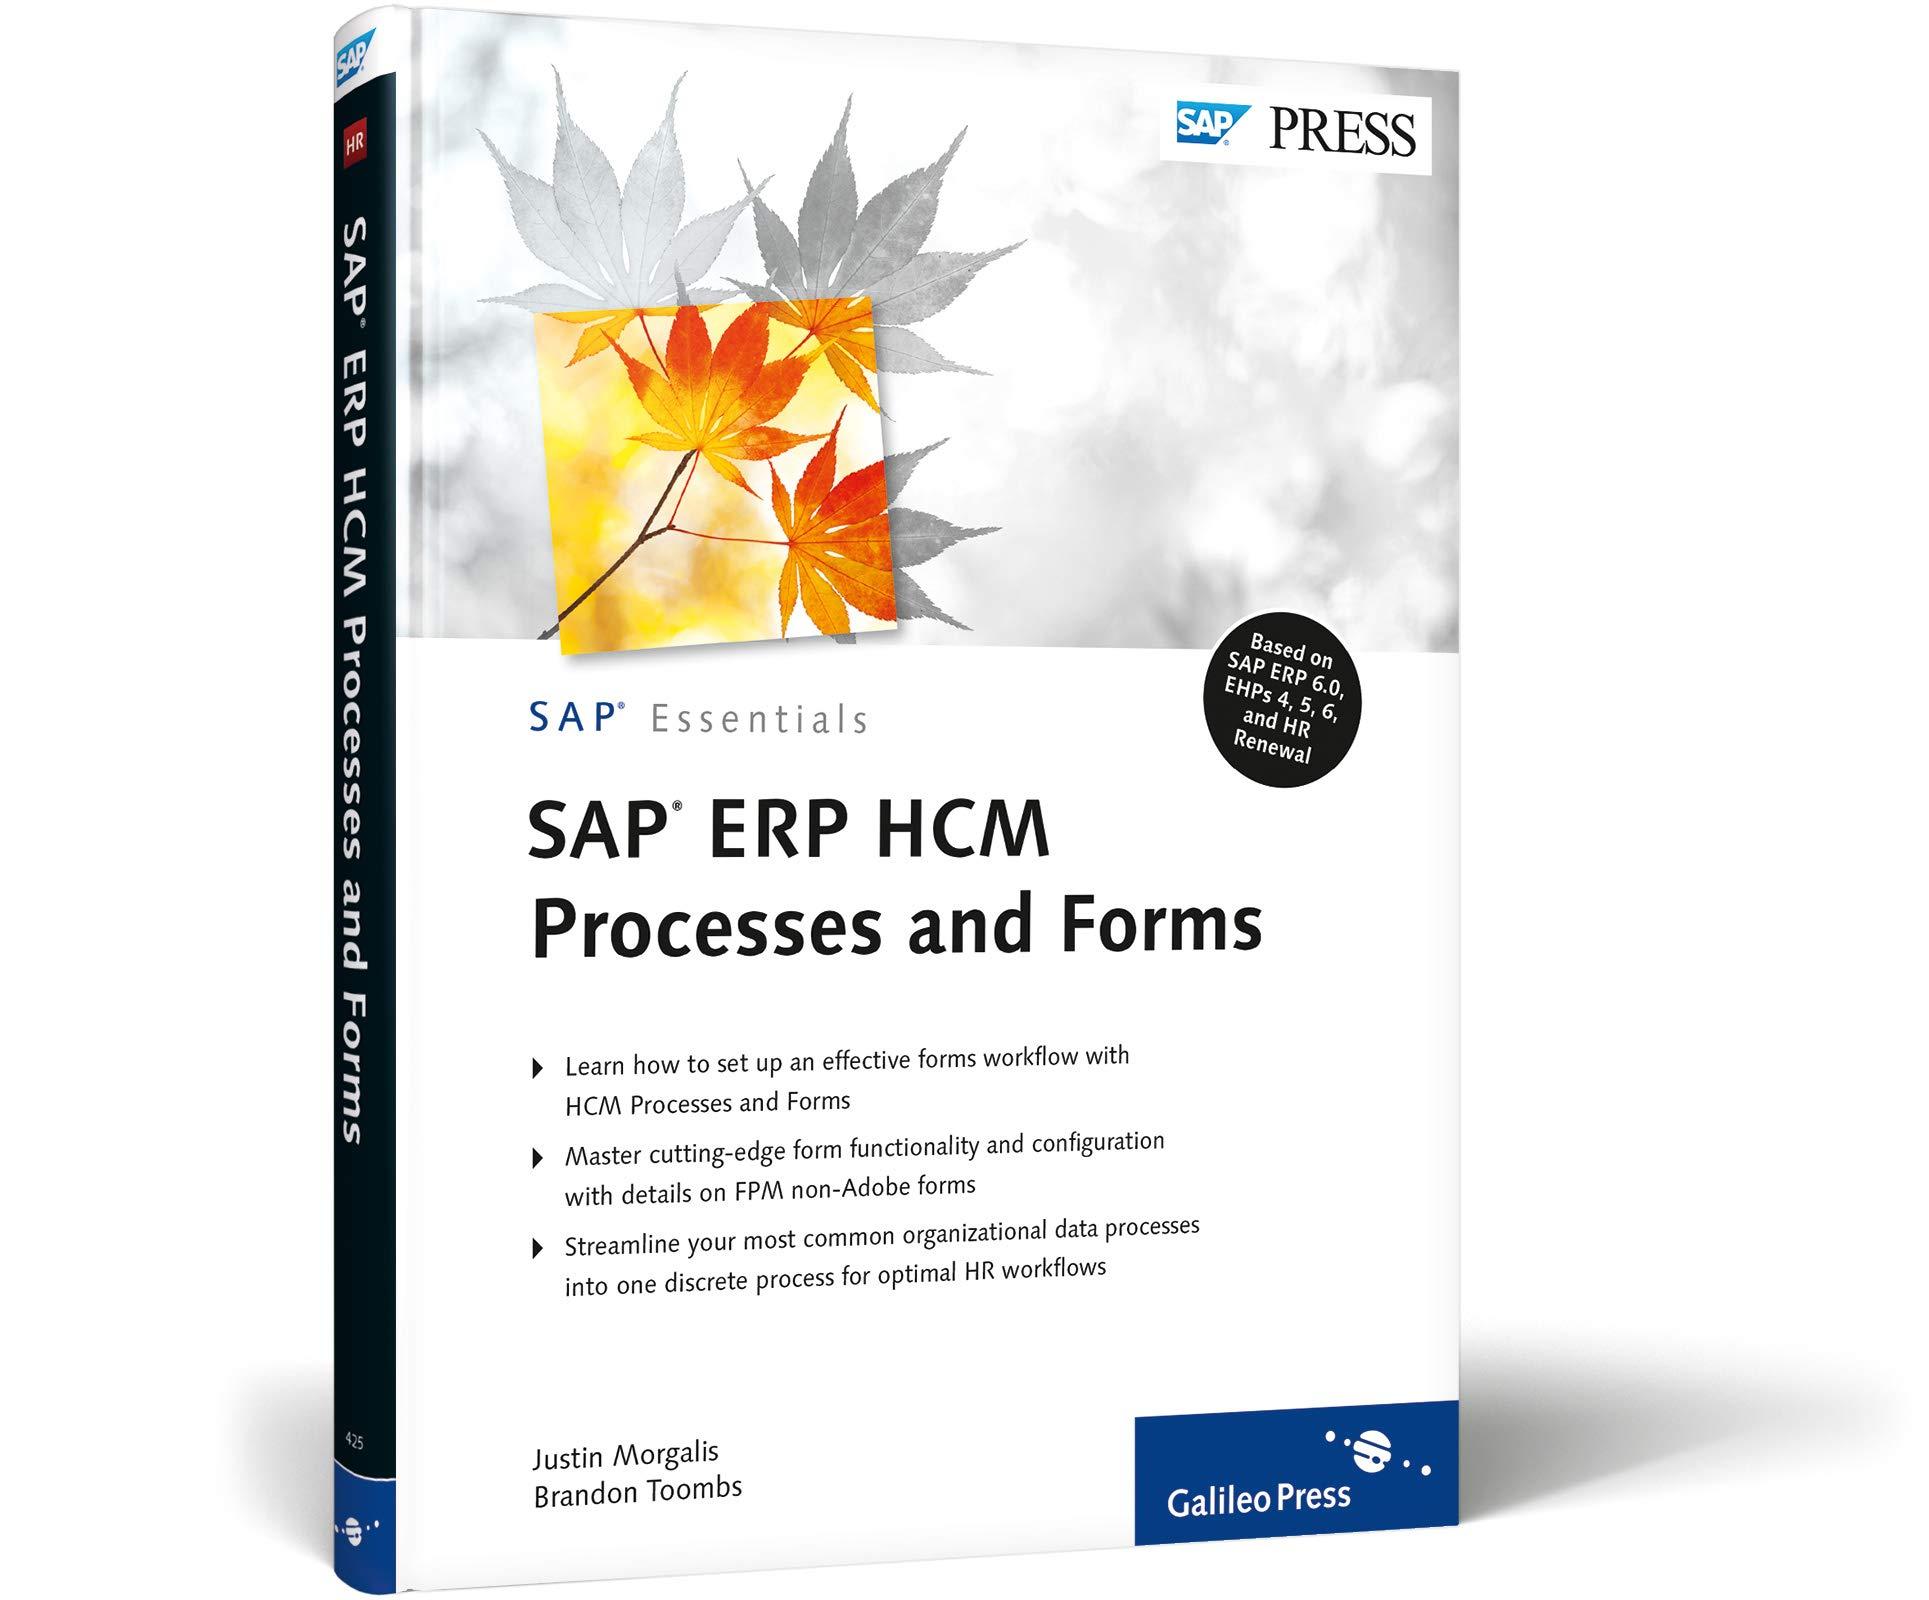 Amazon com: SAP ERP HCM Processes and Forms (9781592294251): Justin